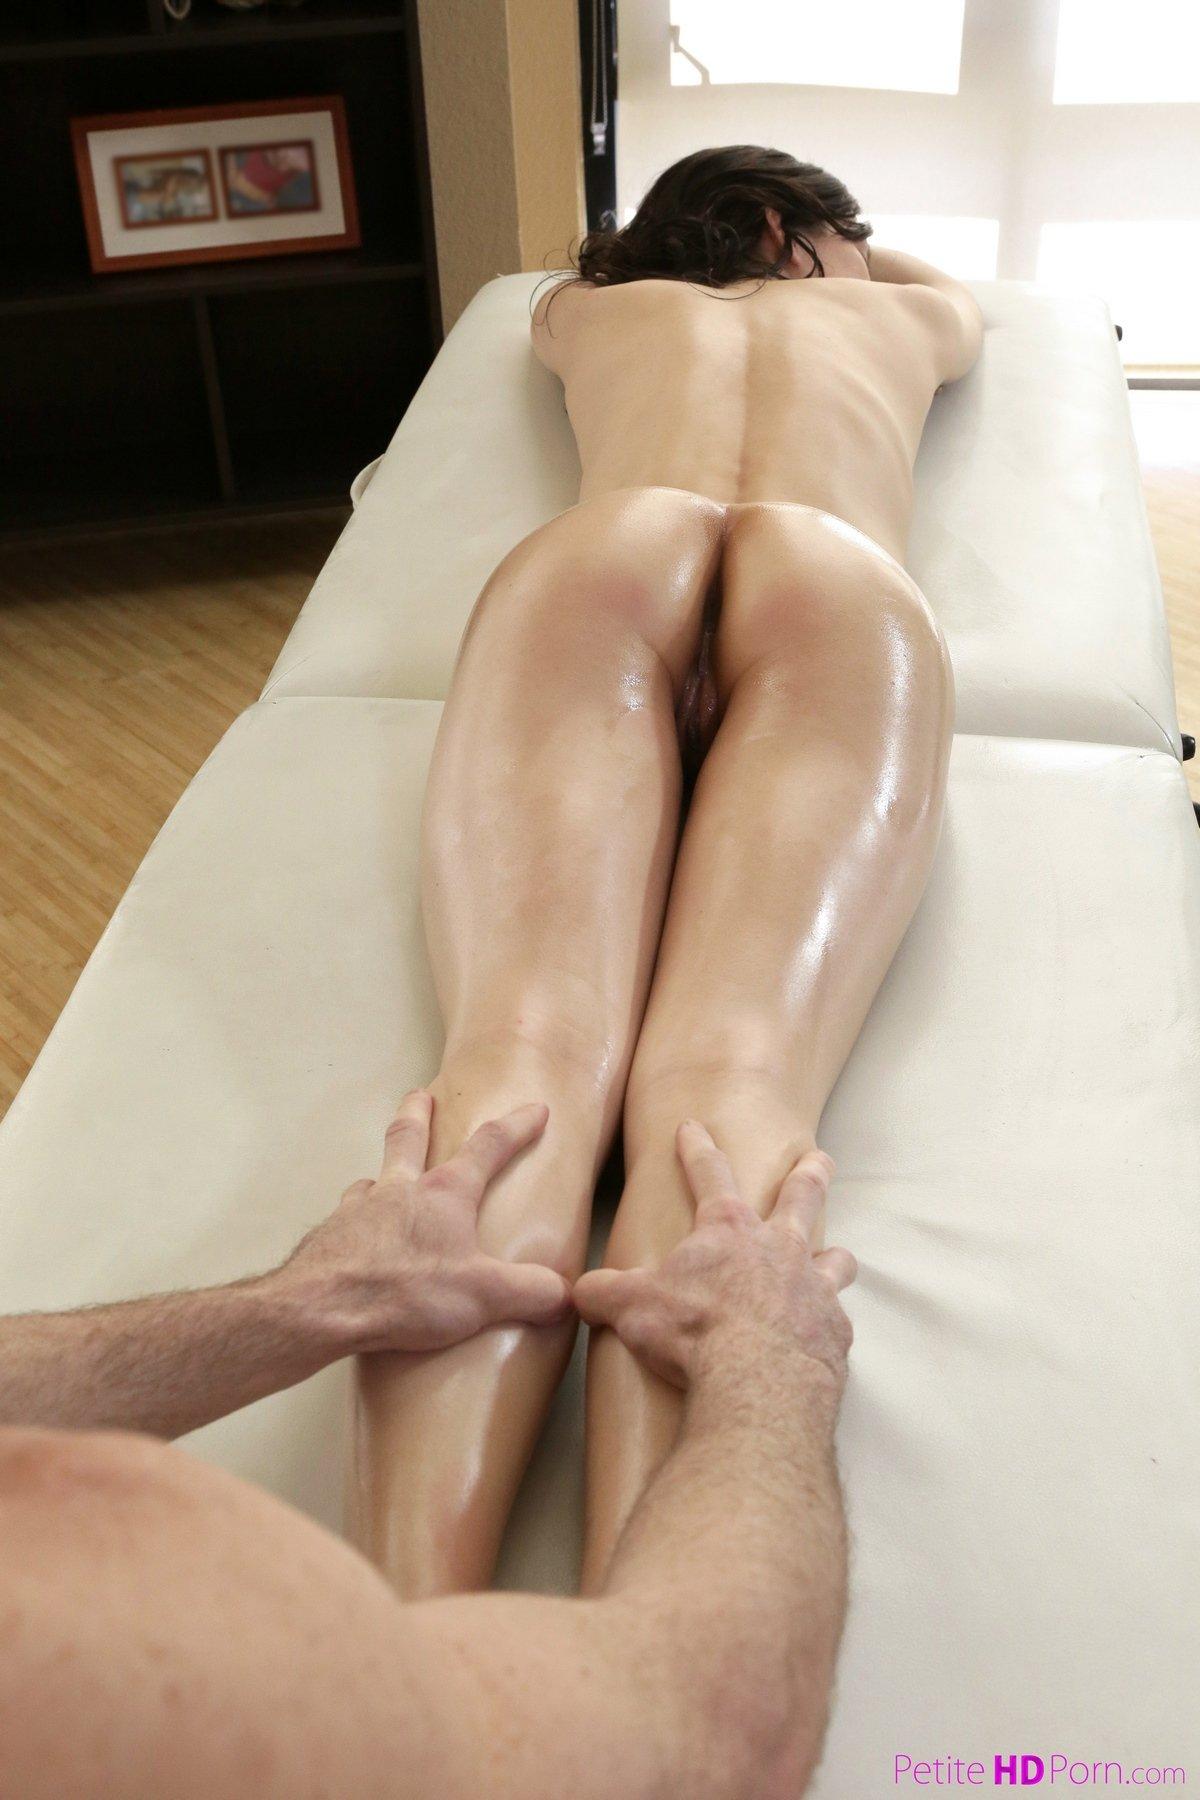 Порно массаж девушкам